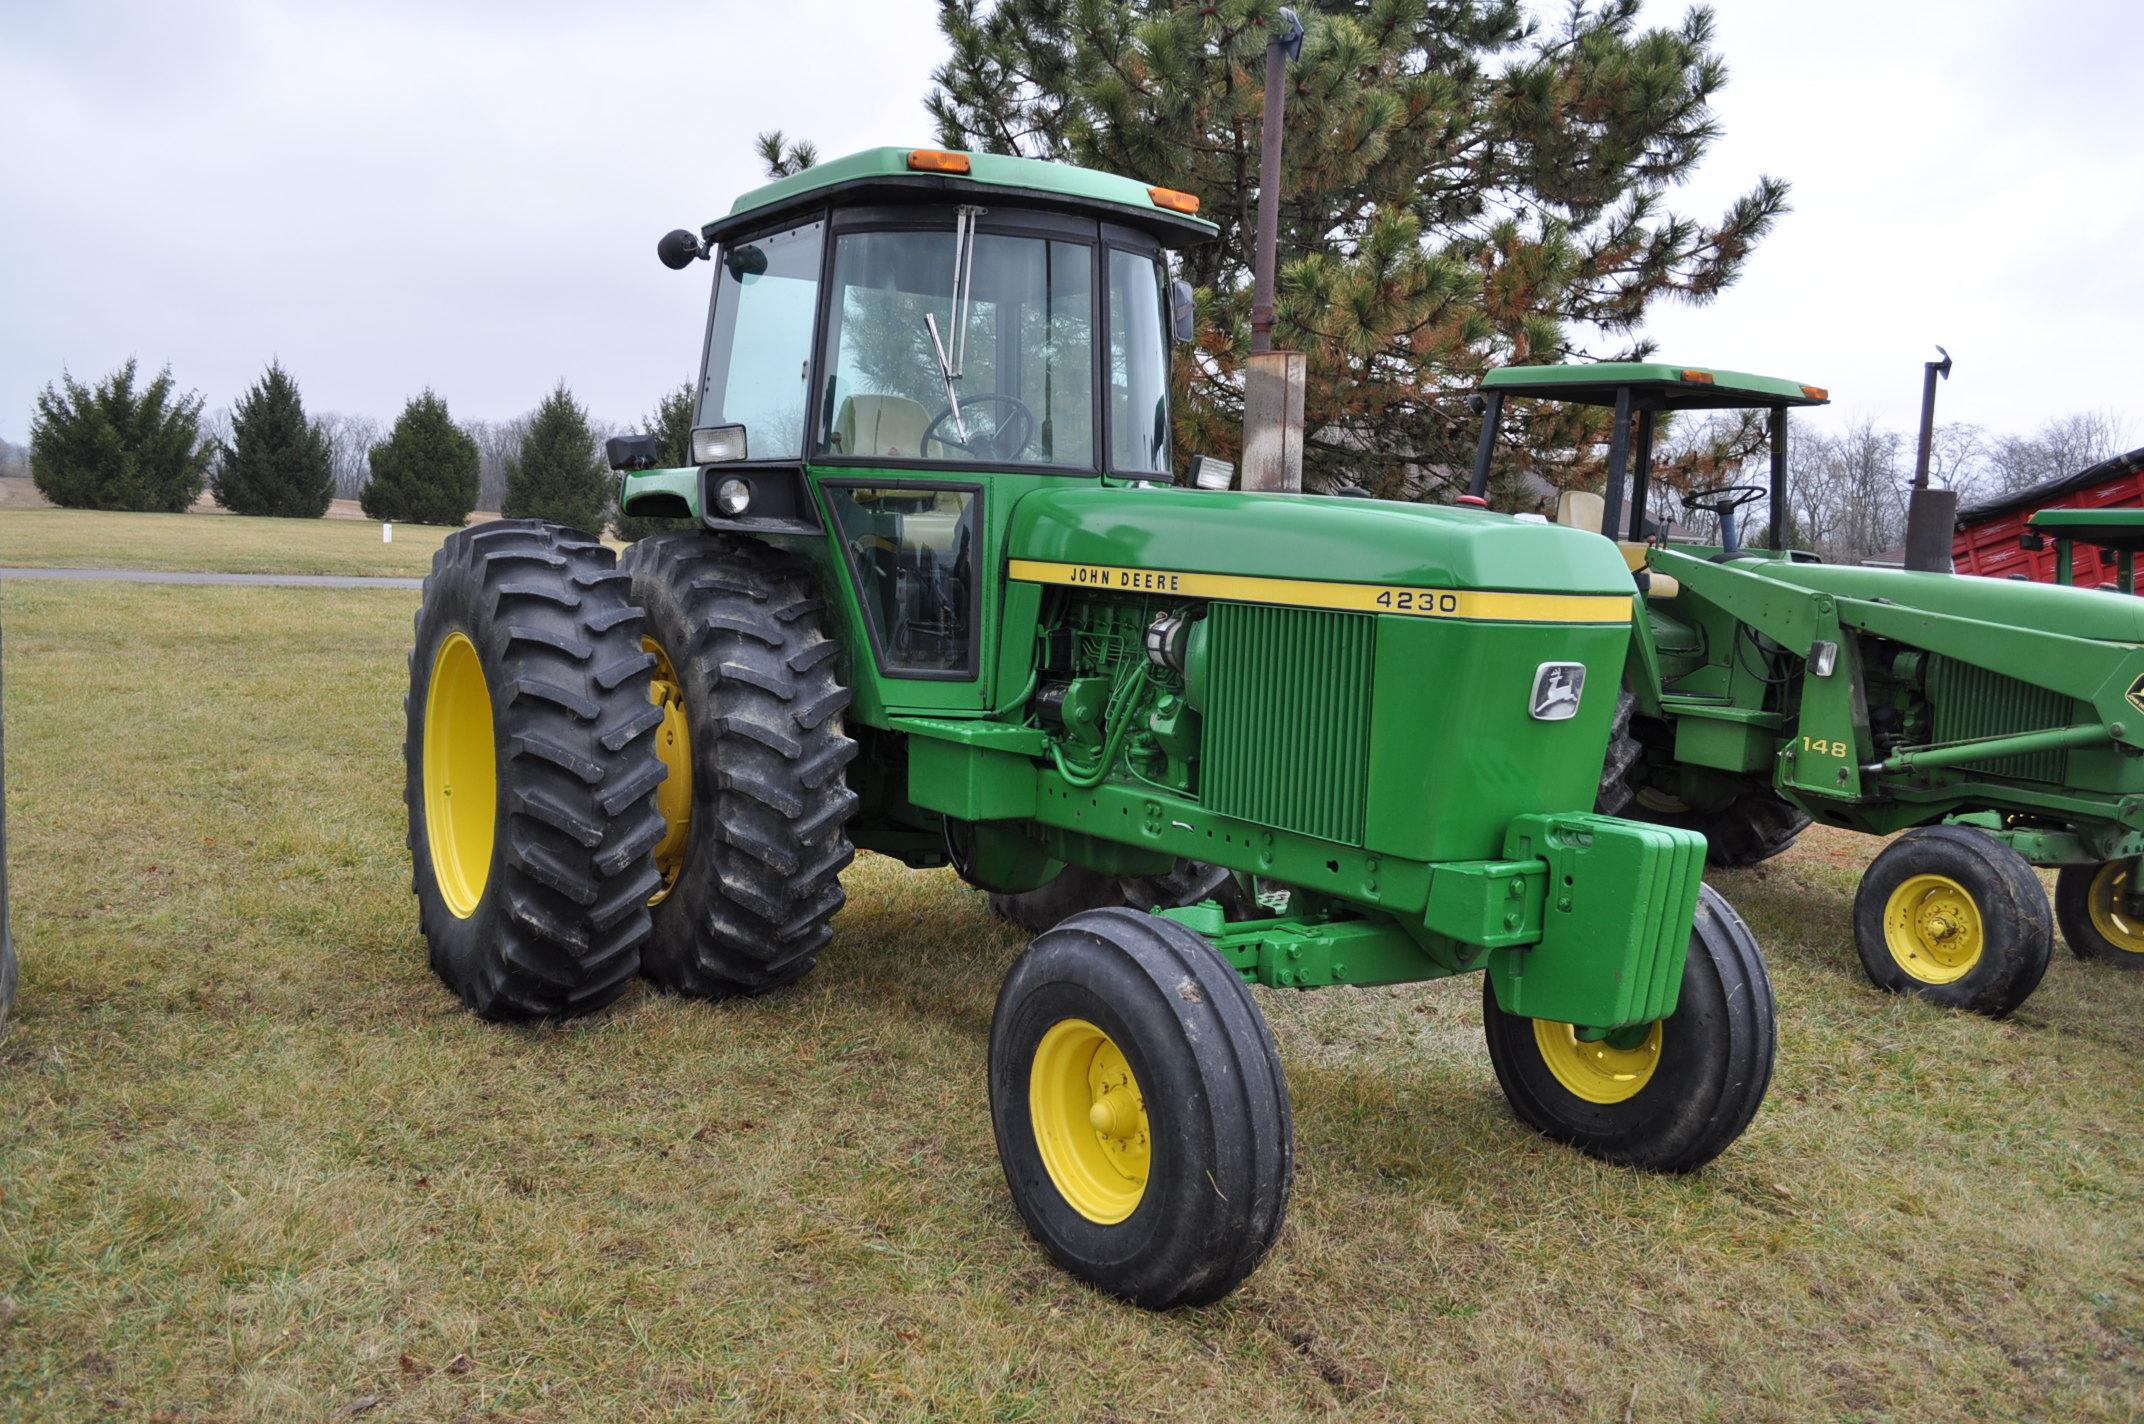 John Deere 4230 tractor, diesel, 18.4-34 hub duals, 10.00-16 front, CHA, Quad range, 2 hyd - Image 4 of 23